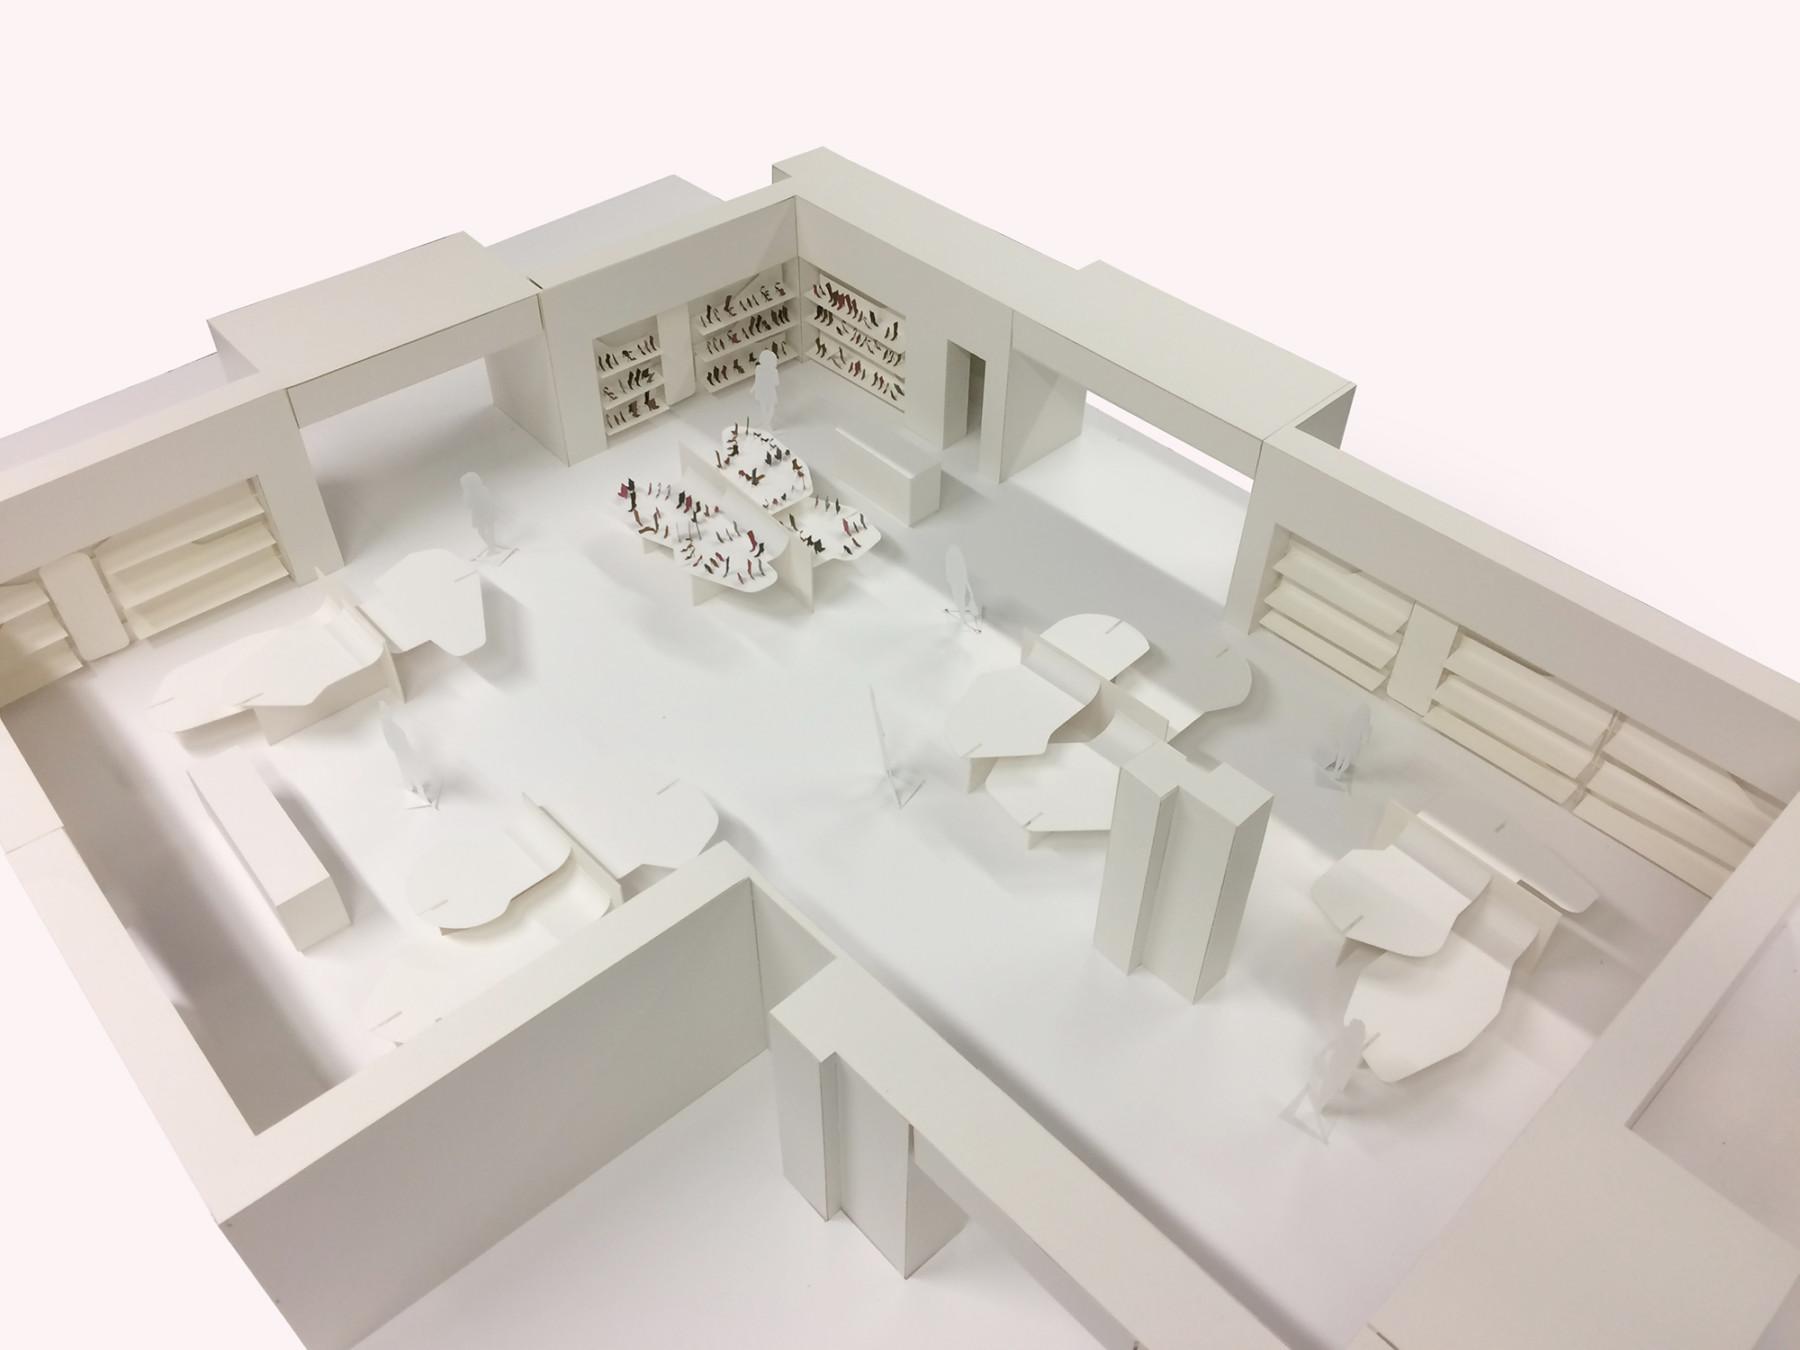 jamie-fobert-architects-selfridges-shoe-galleries-luxury-retail-concept-gallery-2-model1